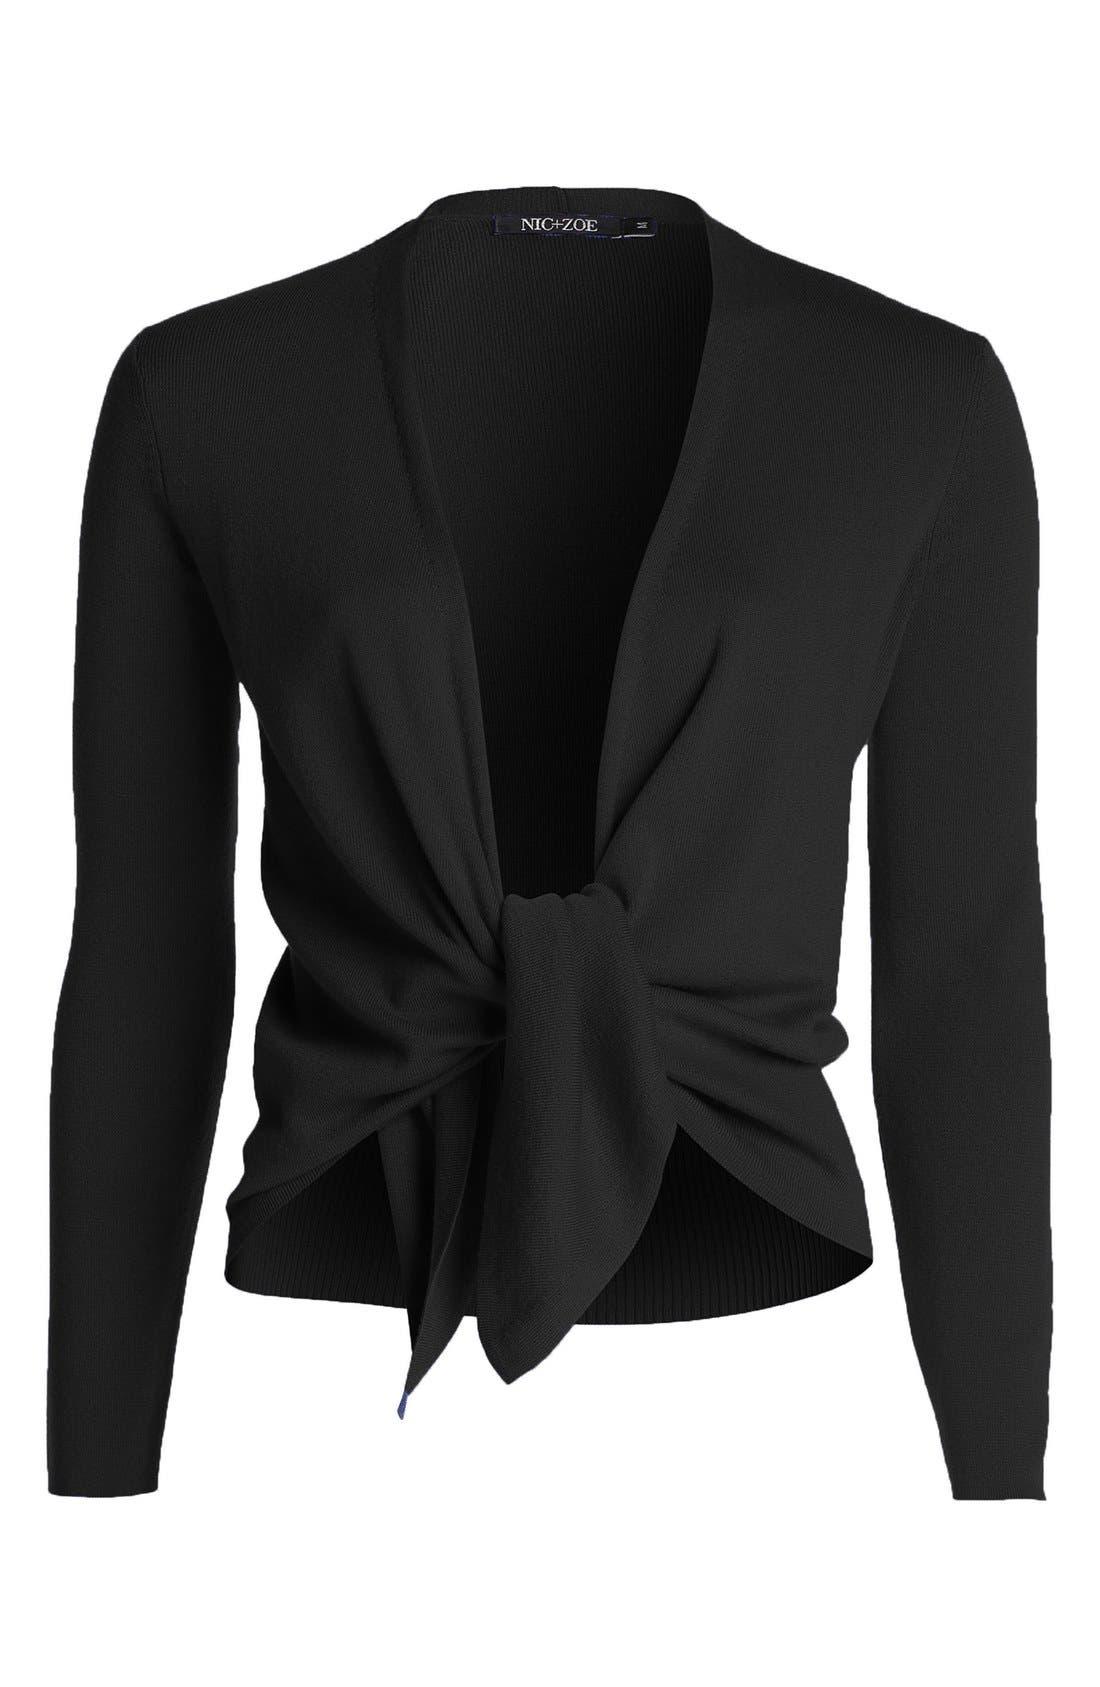 Four-Way Convertible Cardigan,                             Alternate thumbnail 6, color,                             BLACK ONYX